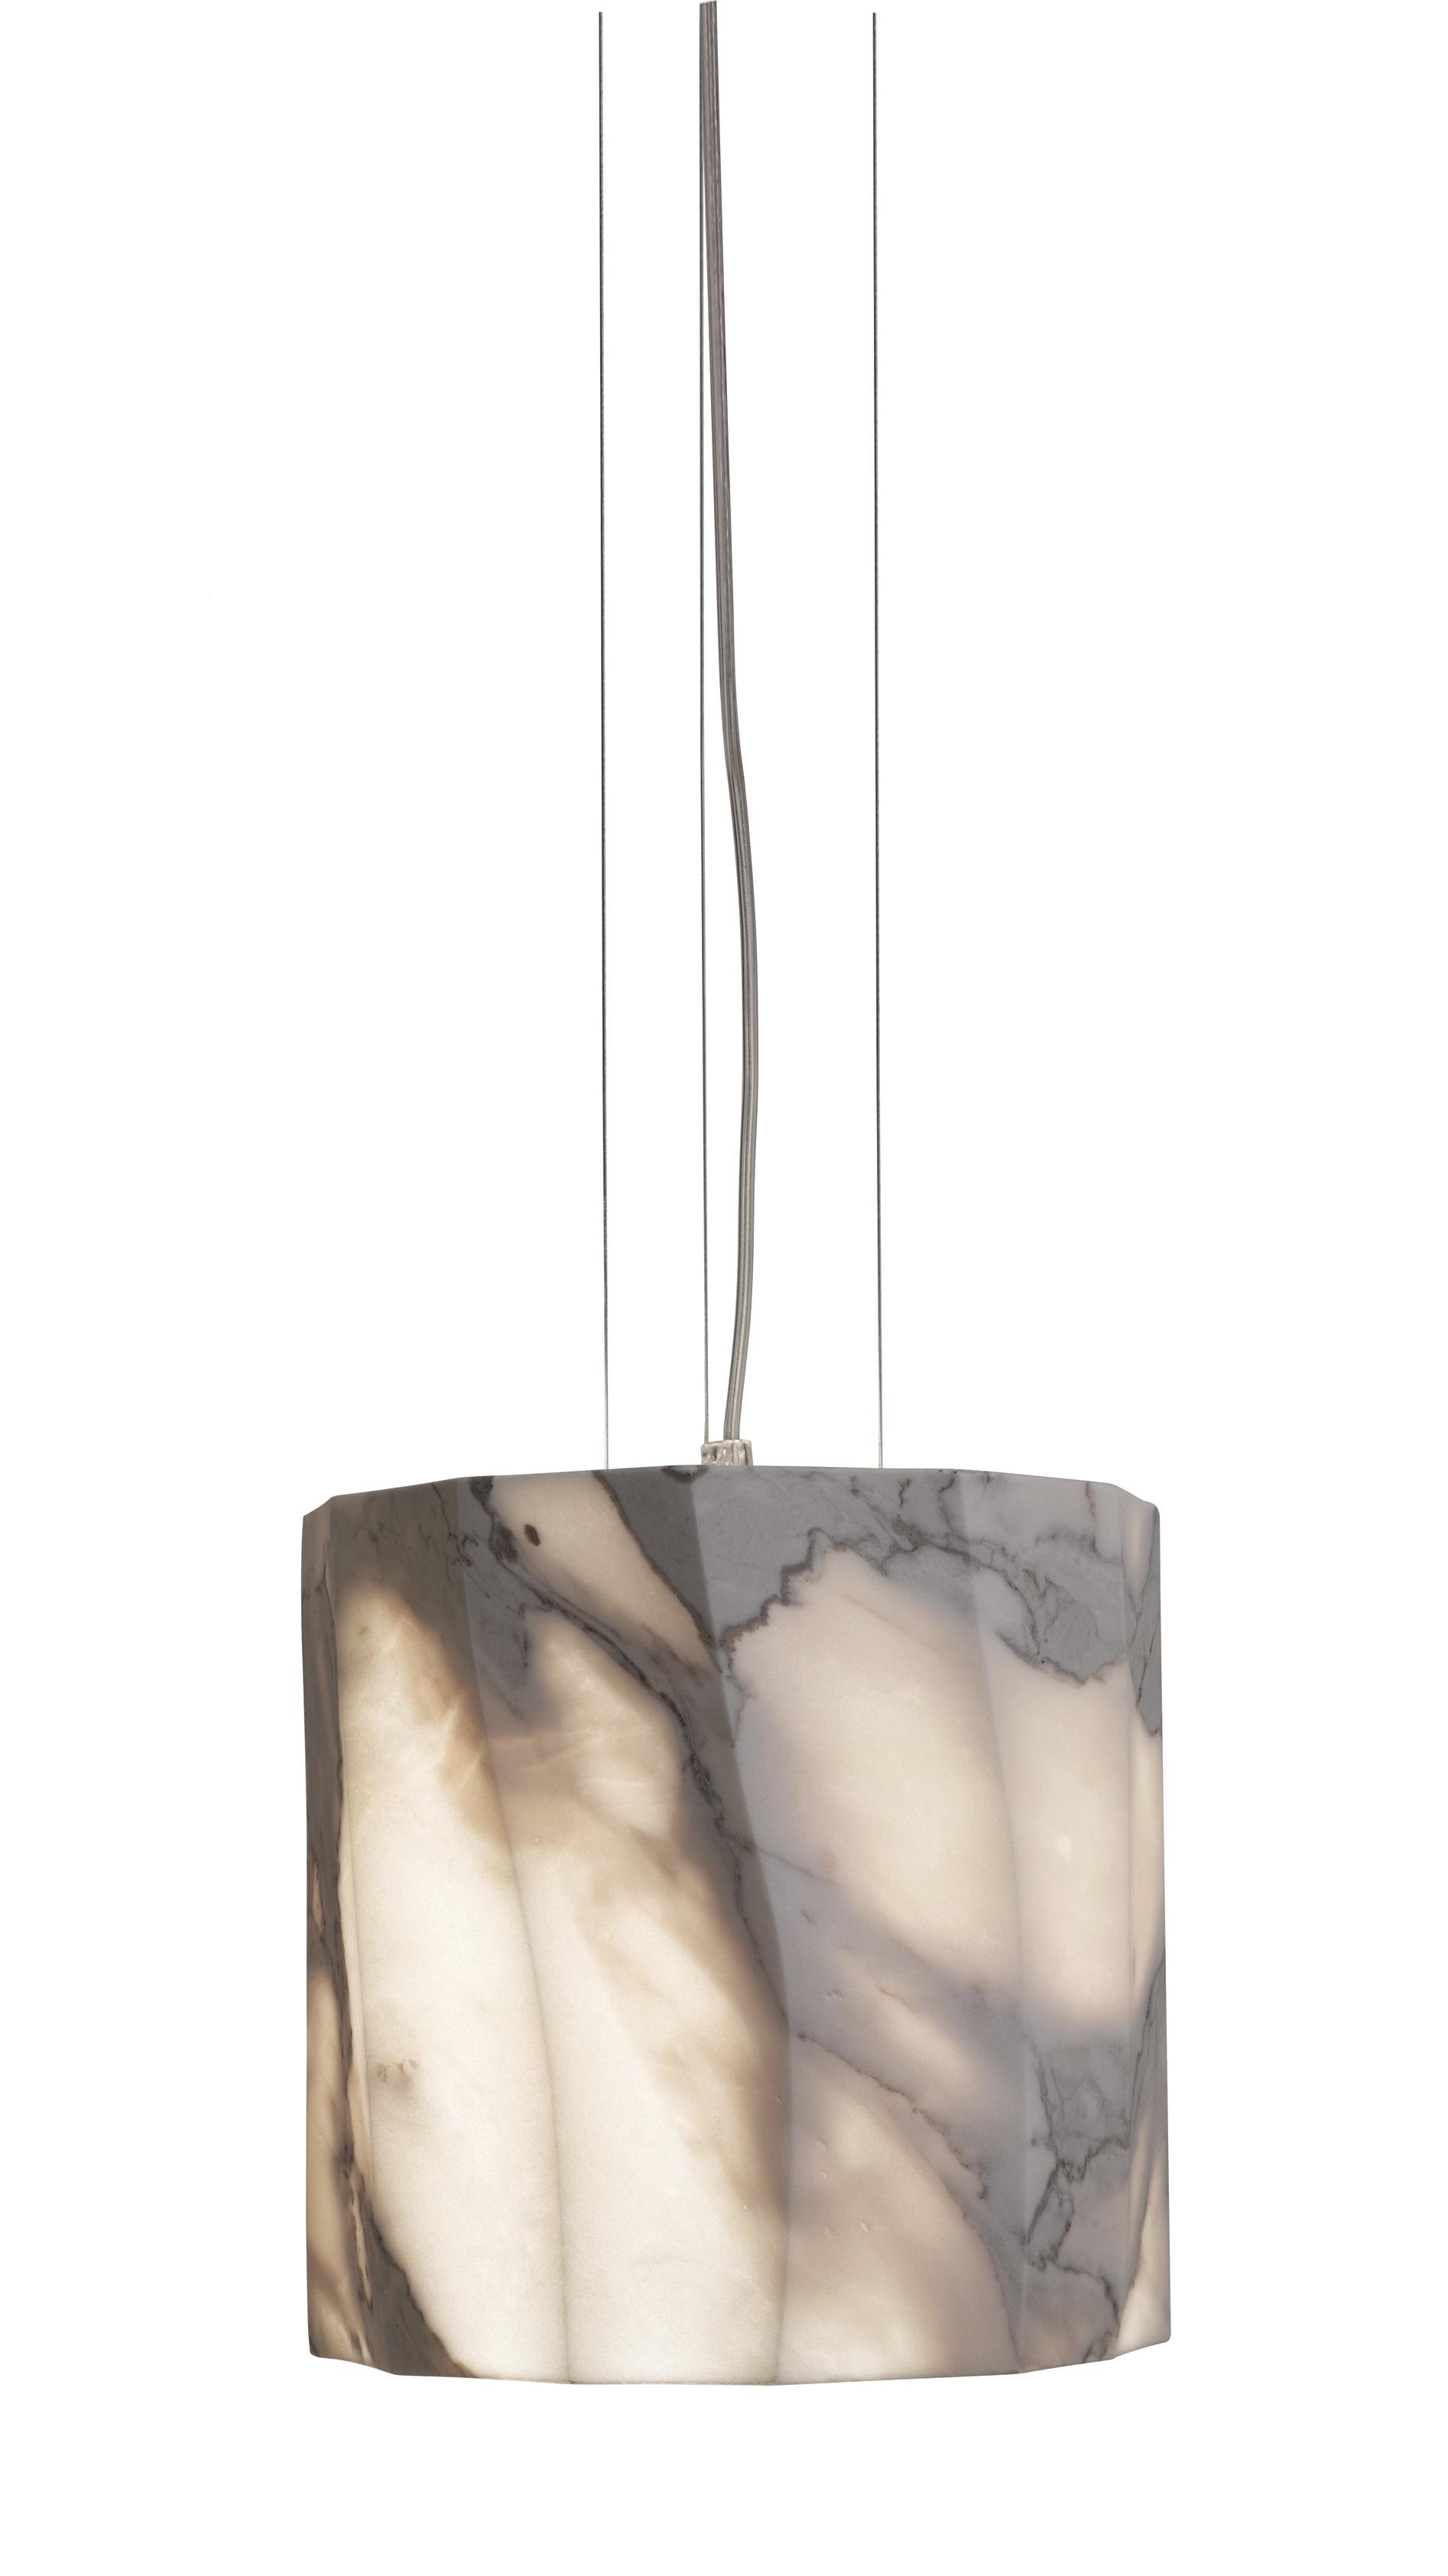 Lampe Fiamma 25